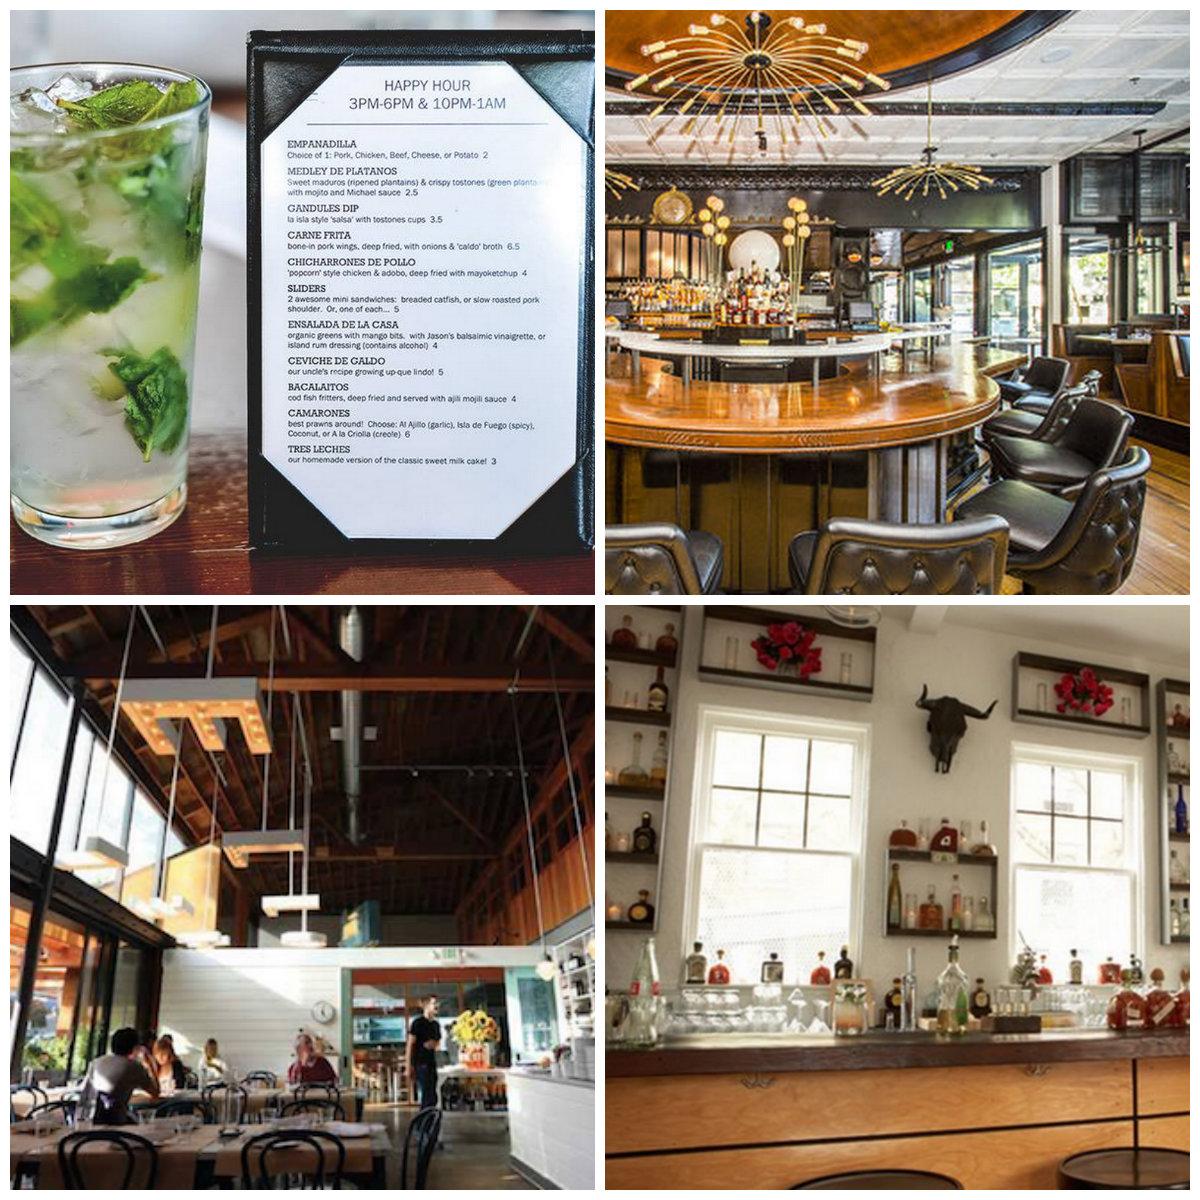 Mistral Kitchen - Eater Seattle